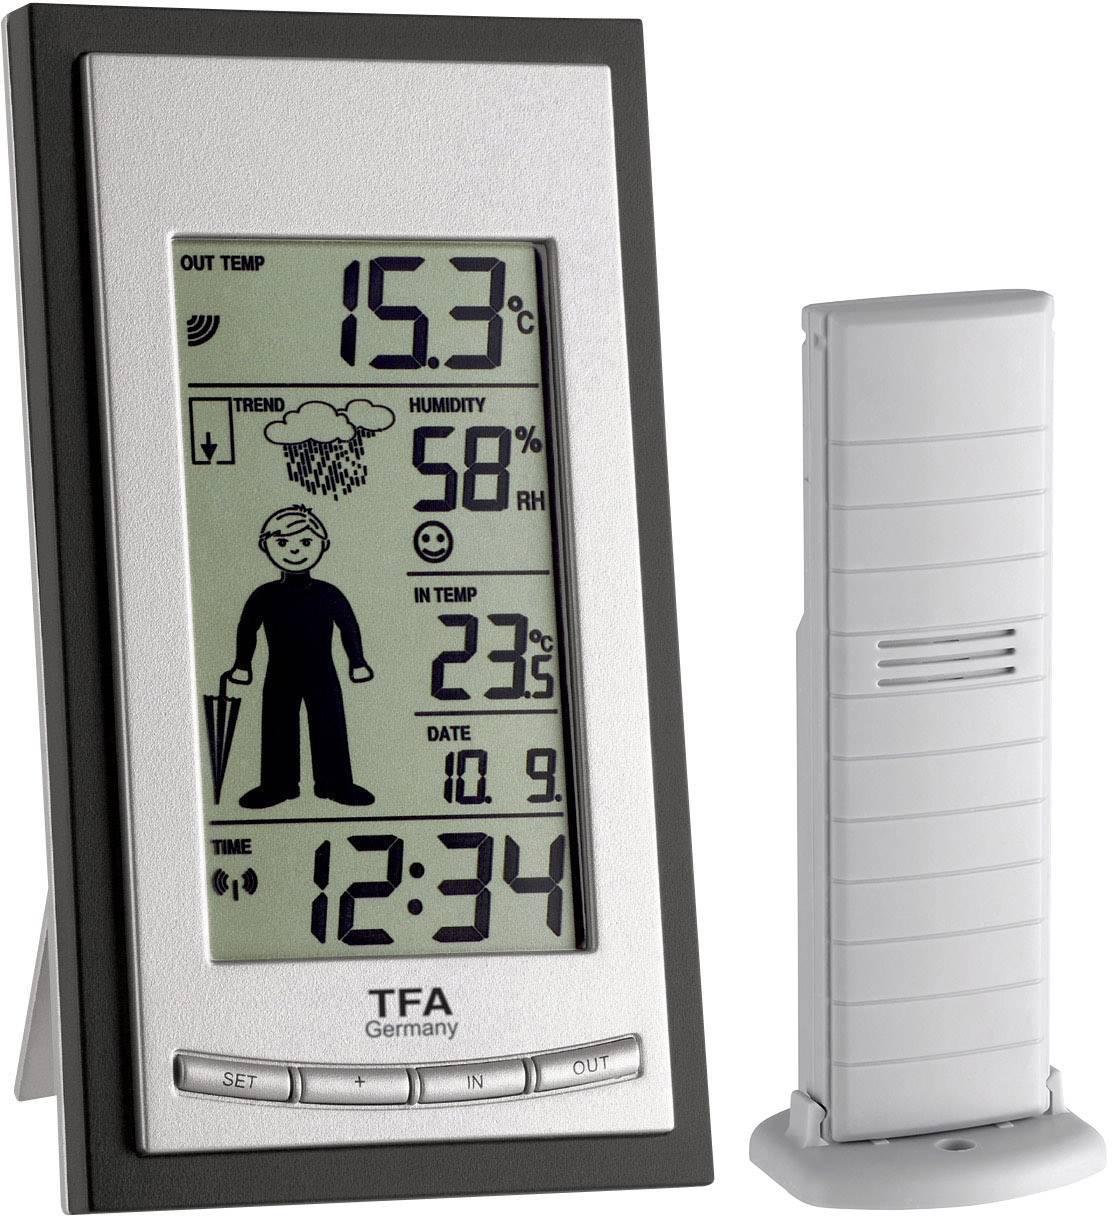 Digitálna bezdrôtová meteostanica TFA Weather Boy 35.1084, max. dosah 100 m, čierna